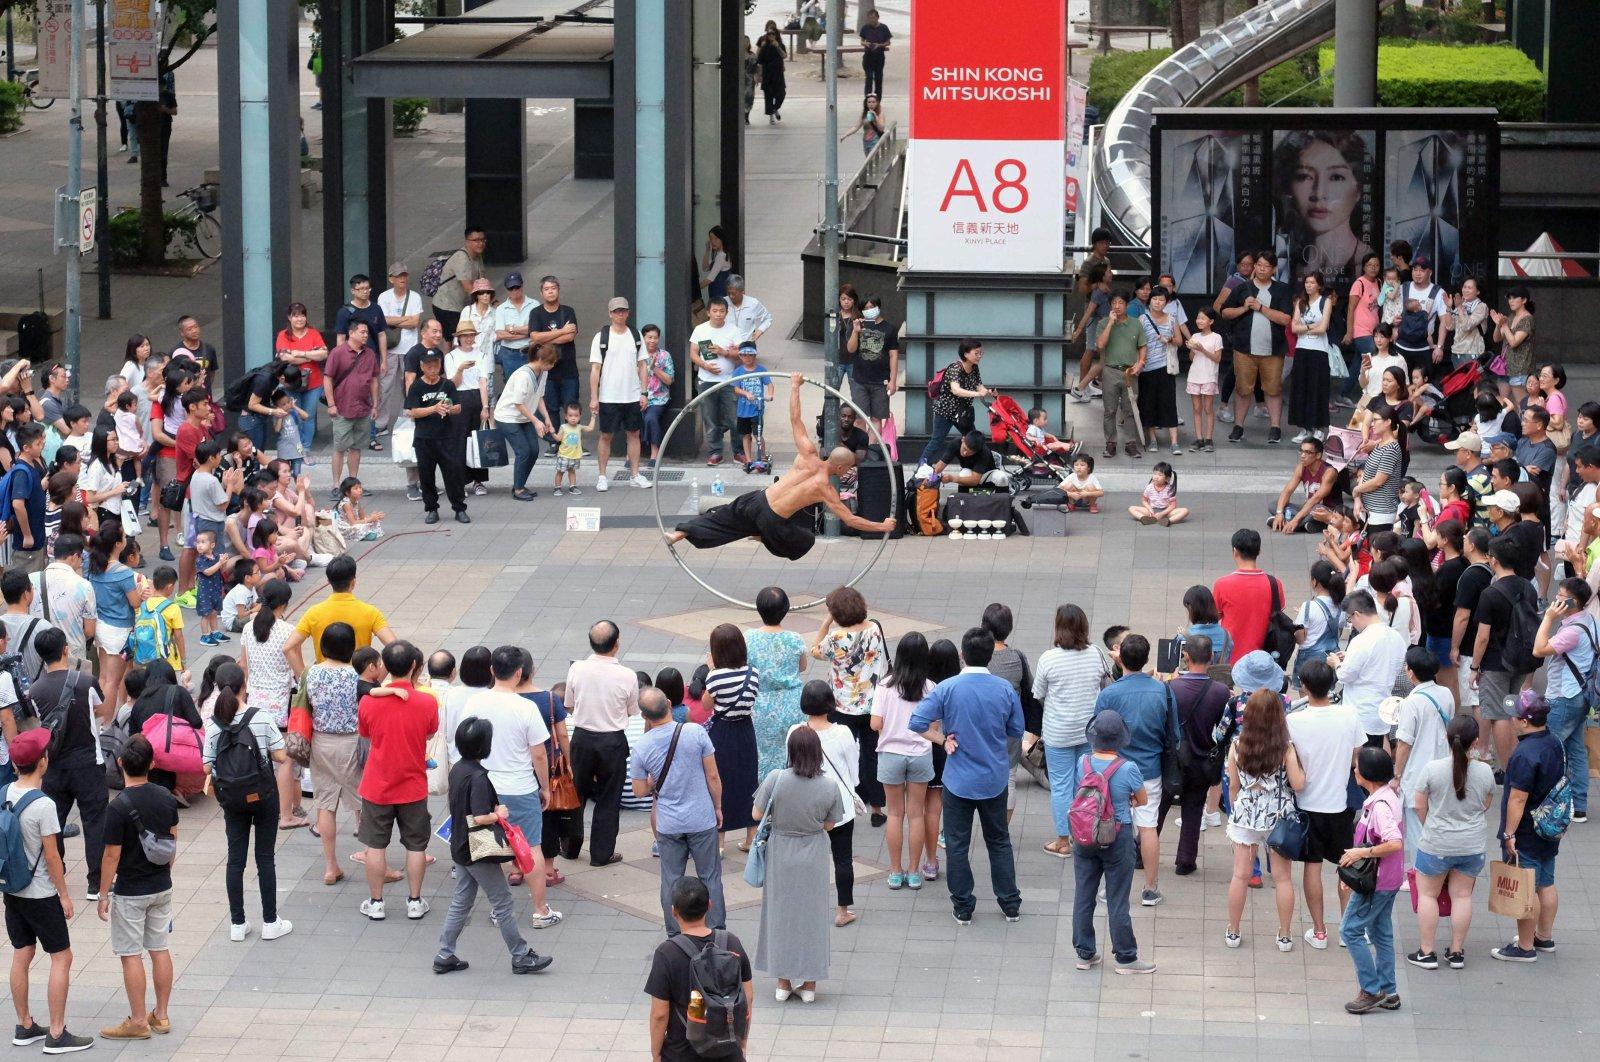 Taiwanese American street artist Isaac Hou (C) perform with a cyr wheel in Taipei, Taiwan, Aug. 12, 2018  (AFP Photo)